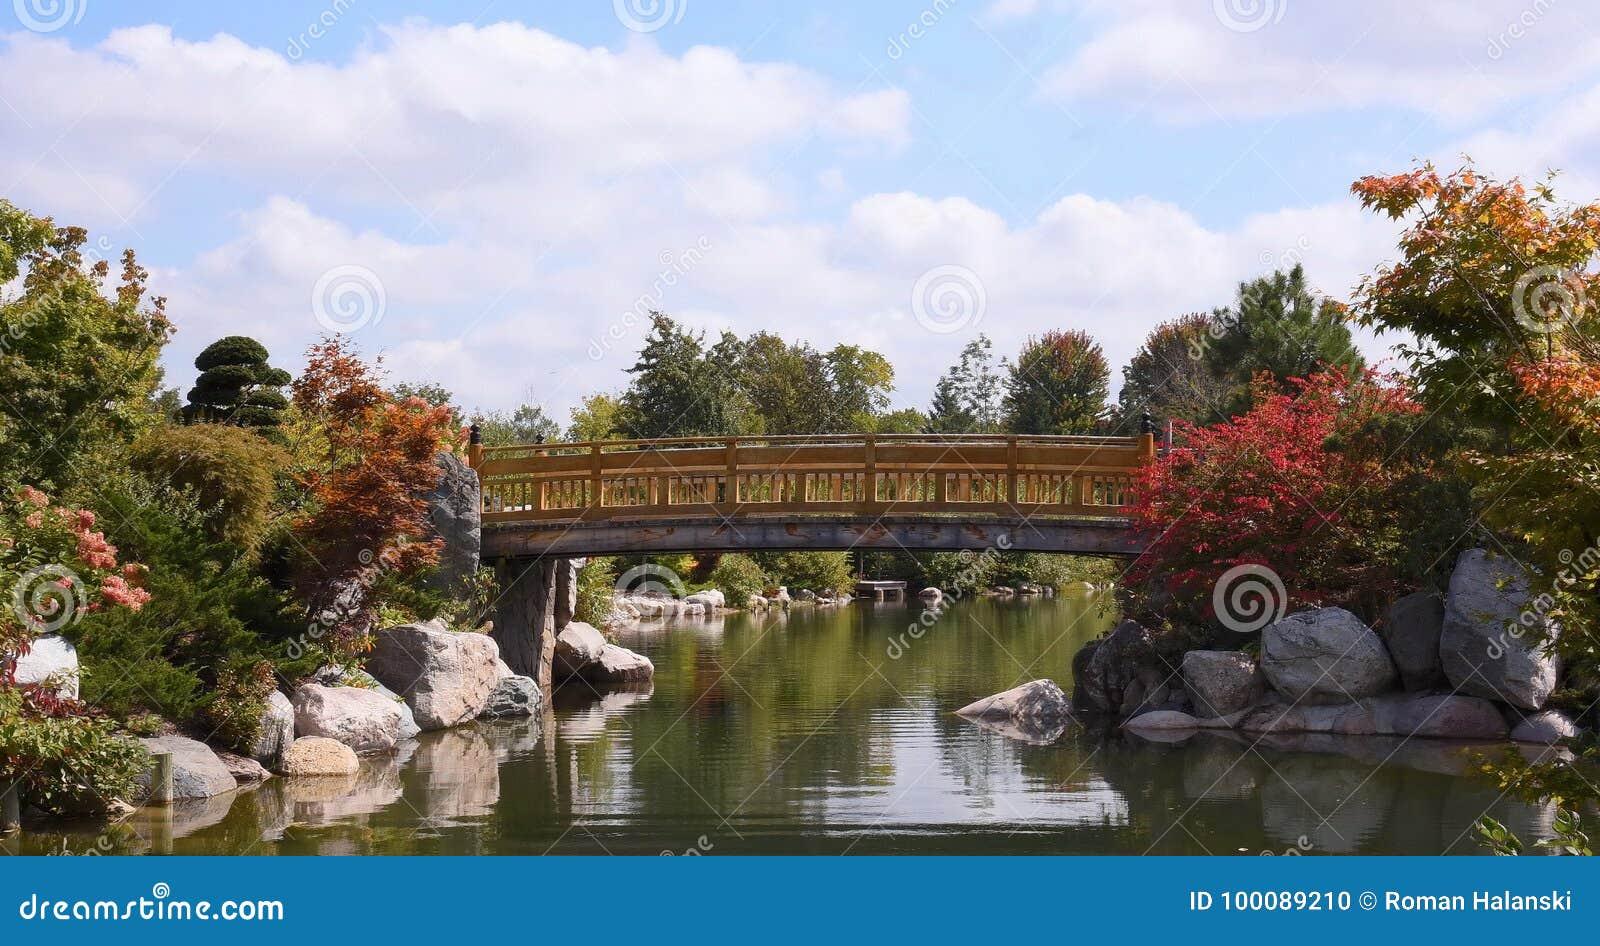 Japanese Garden In Grand Rapids, MI Stock Photo - Image of view ...